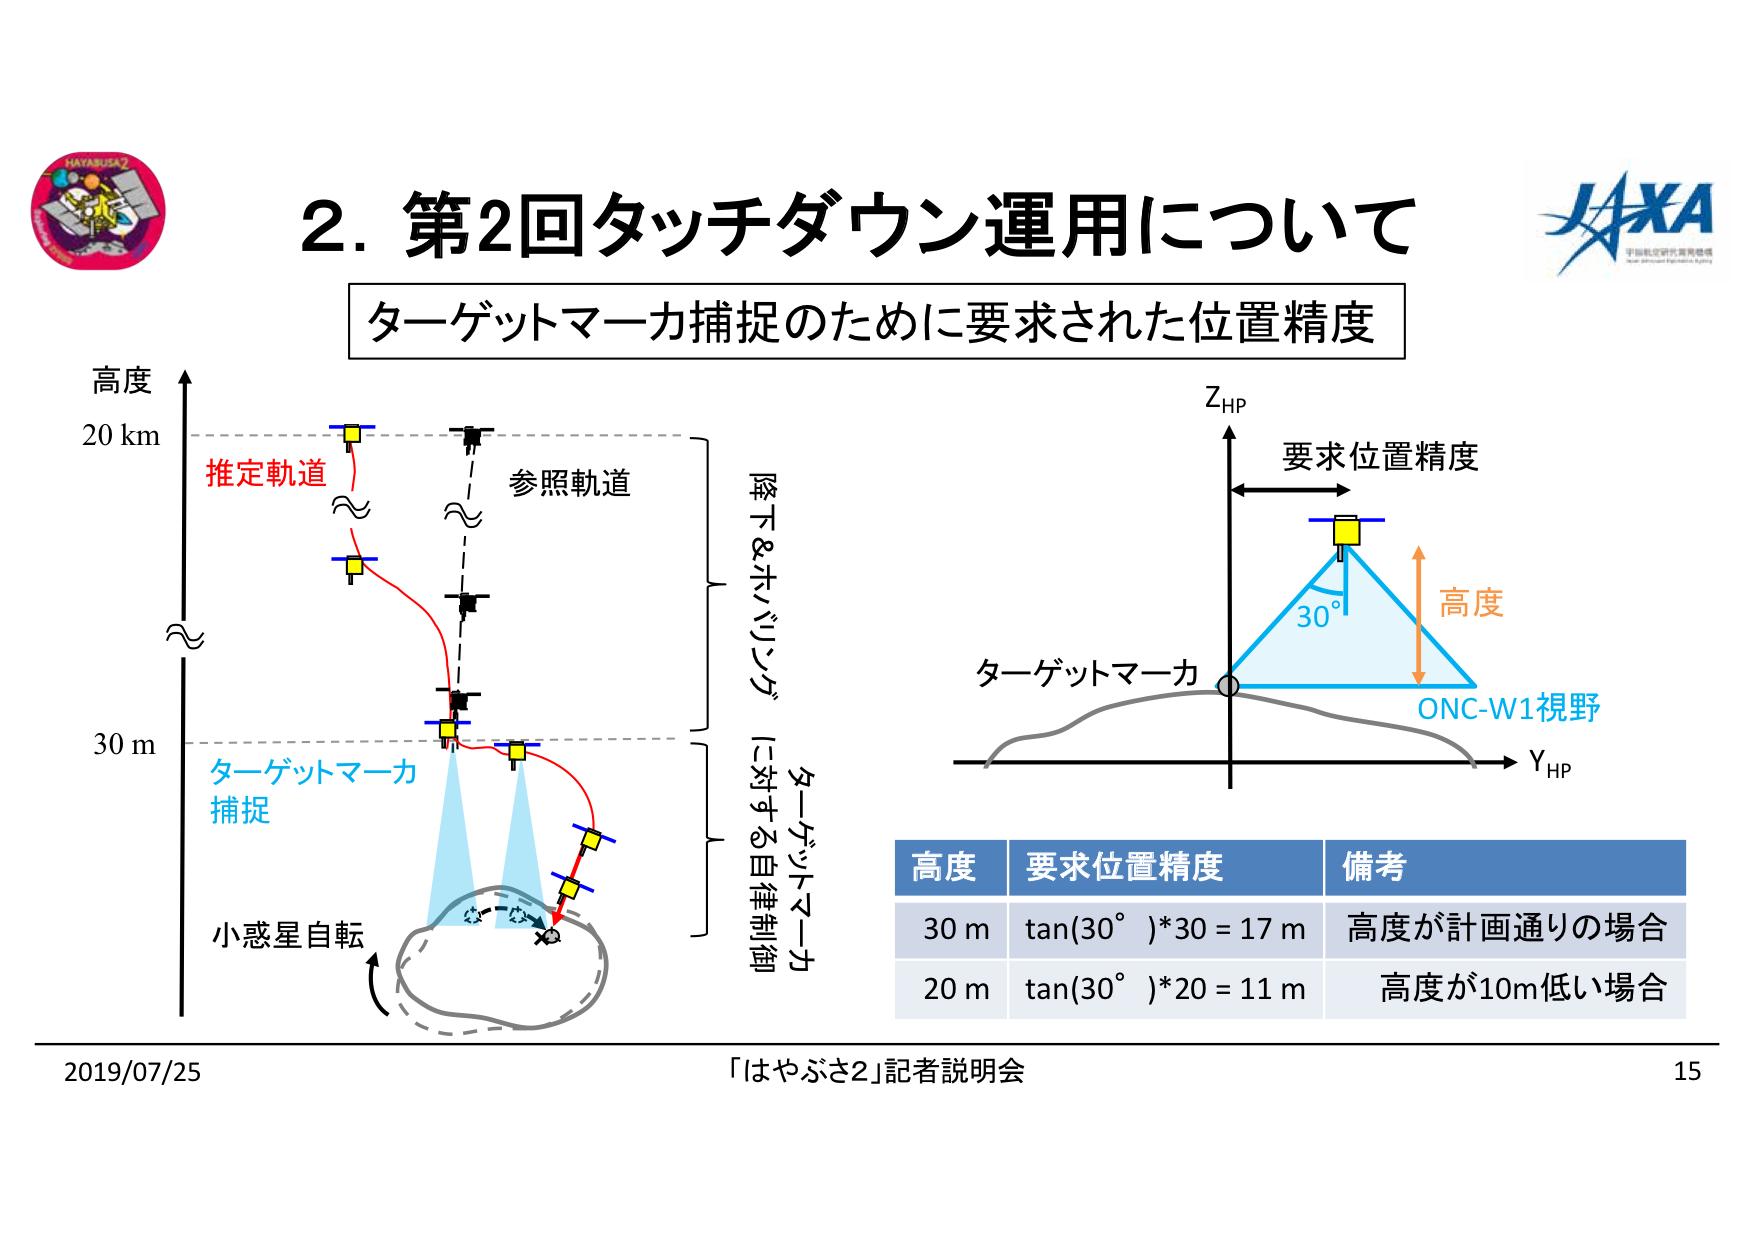 f:id:Imamura:20190725151208p:plain